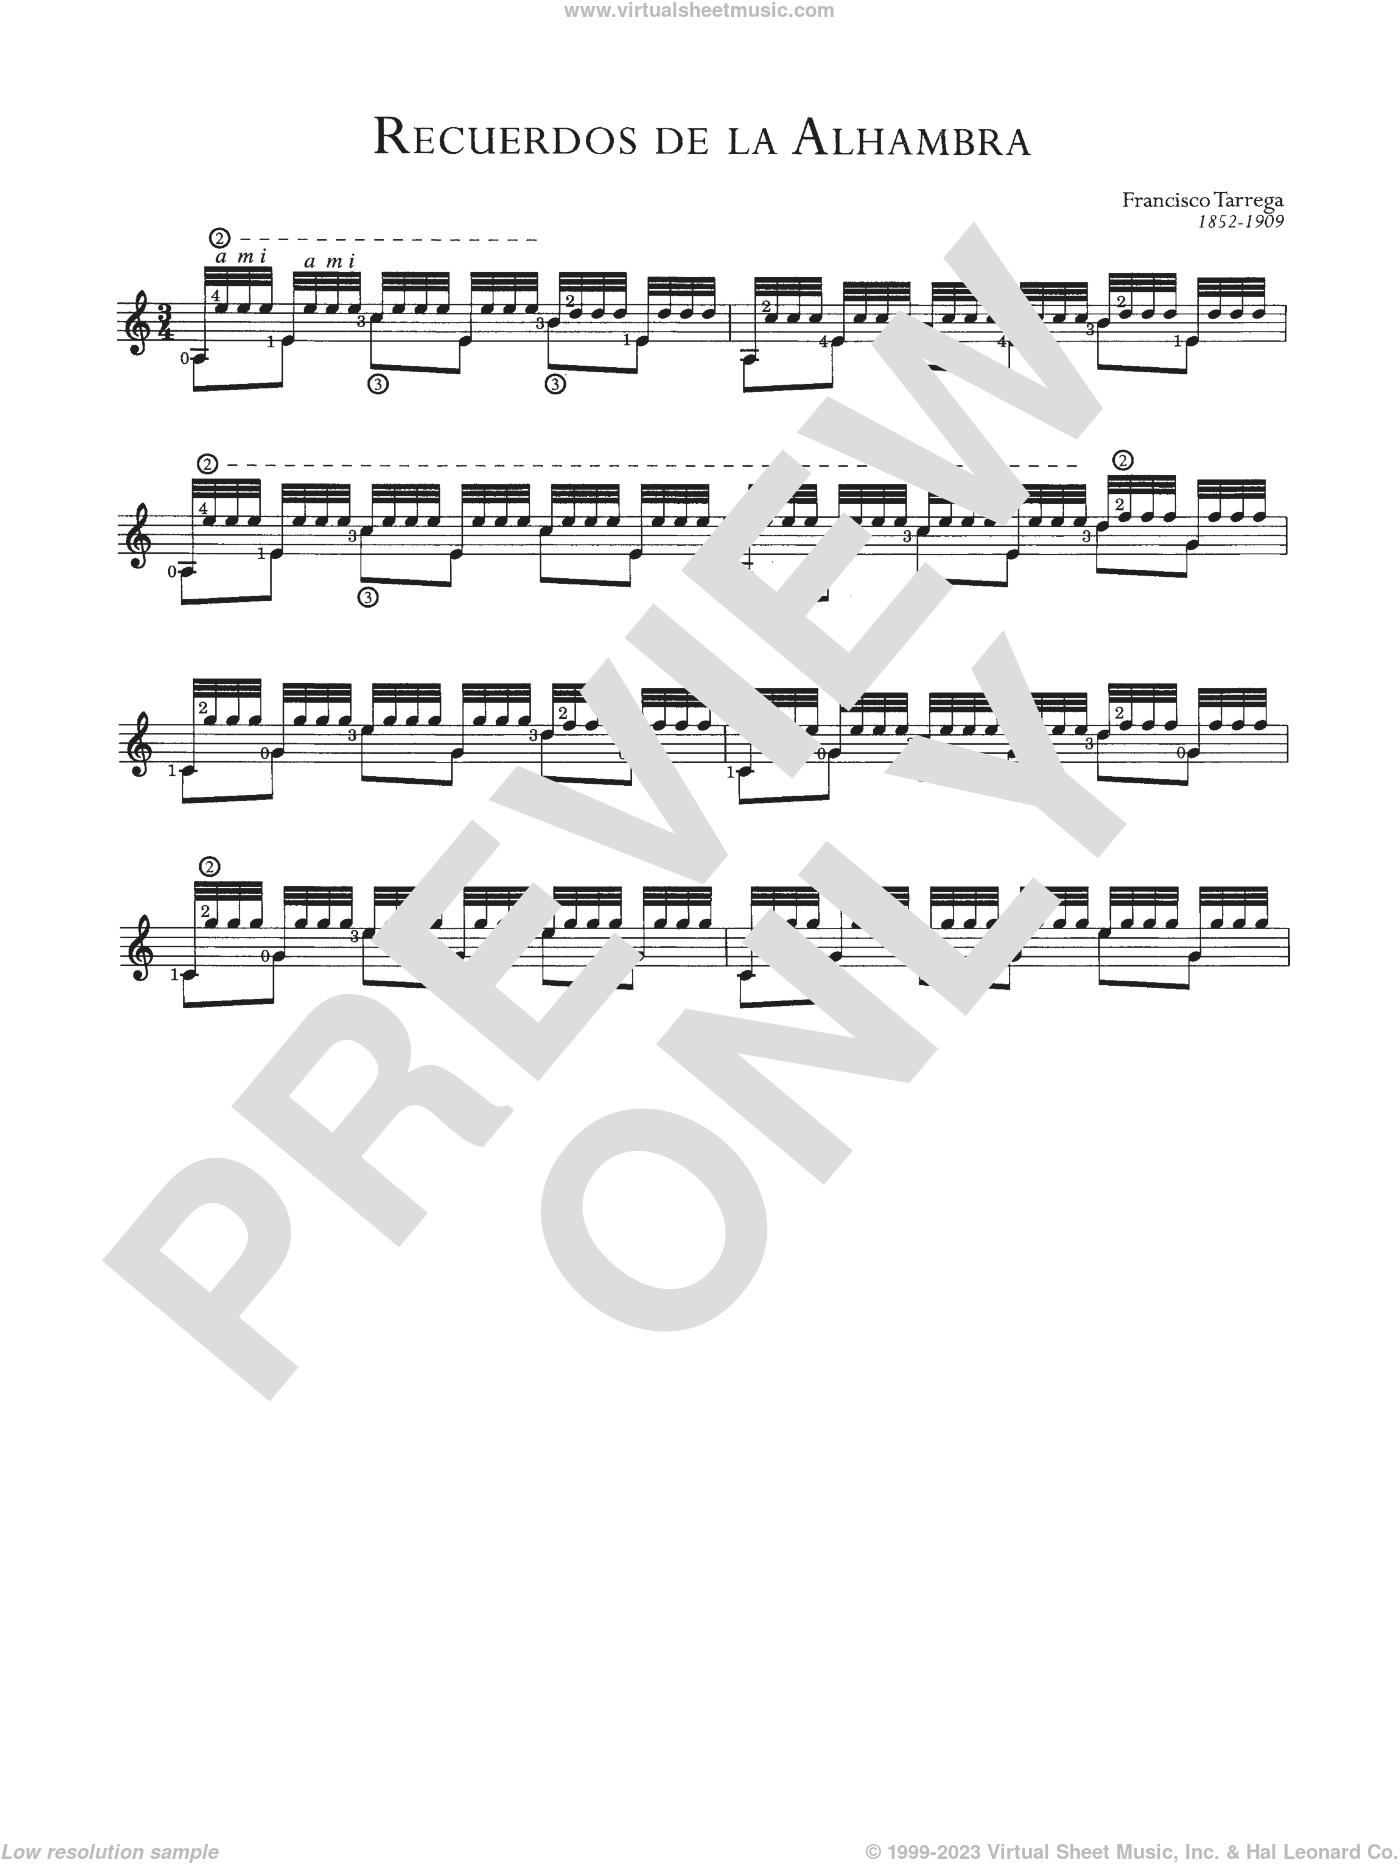 Tarrega - Recuerdos De La Alhambra sheet music for guitar solo (chords)